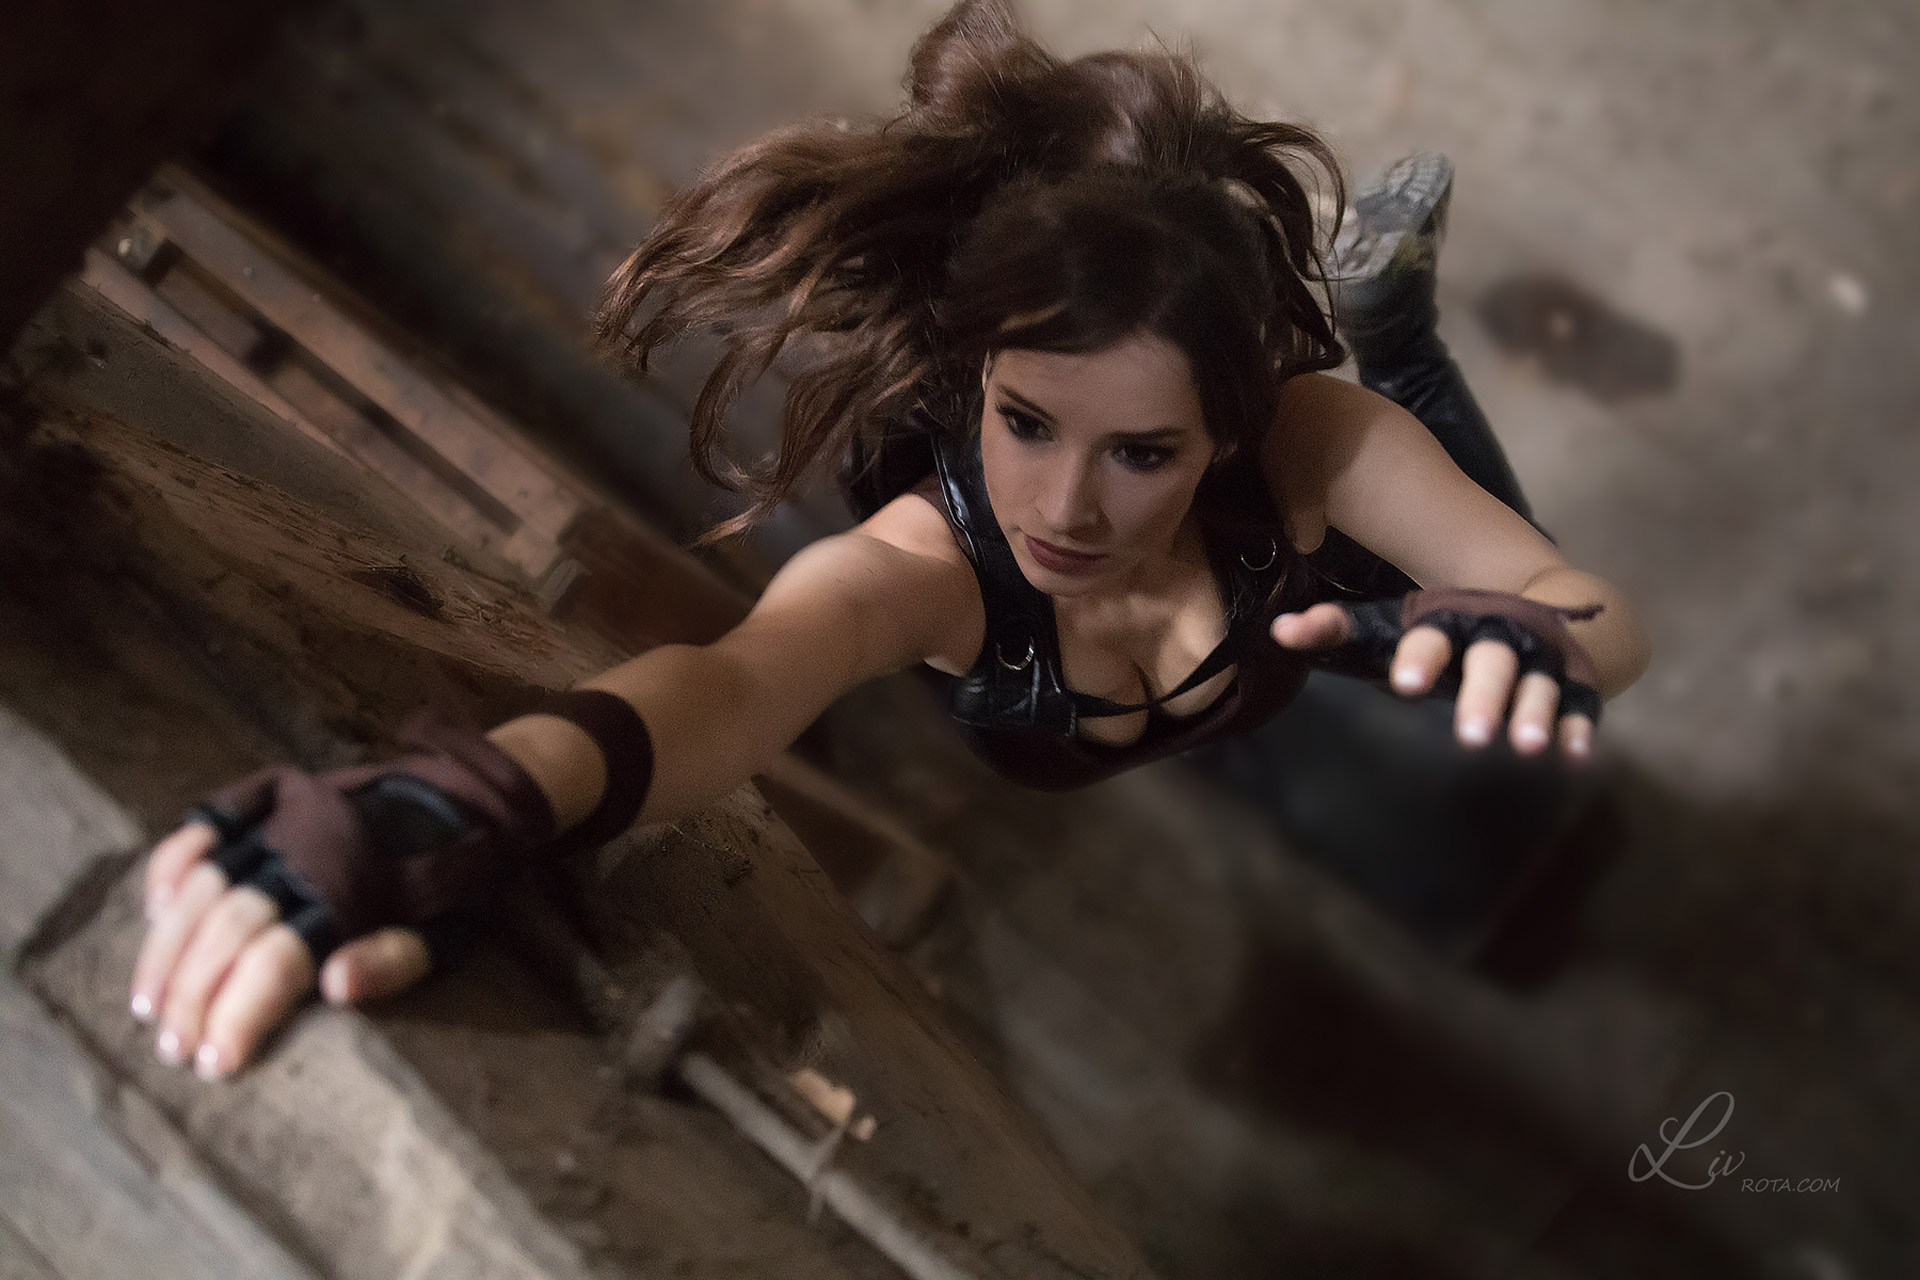 Lara Croft Cosplay, HD Girls, 4k Wallpapers, Images